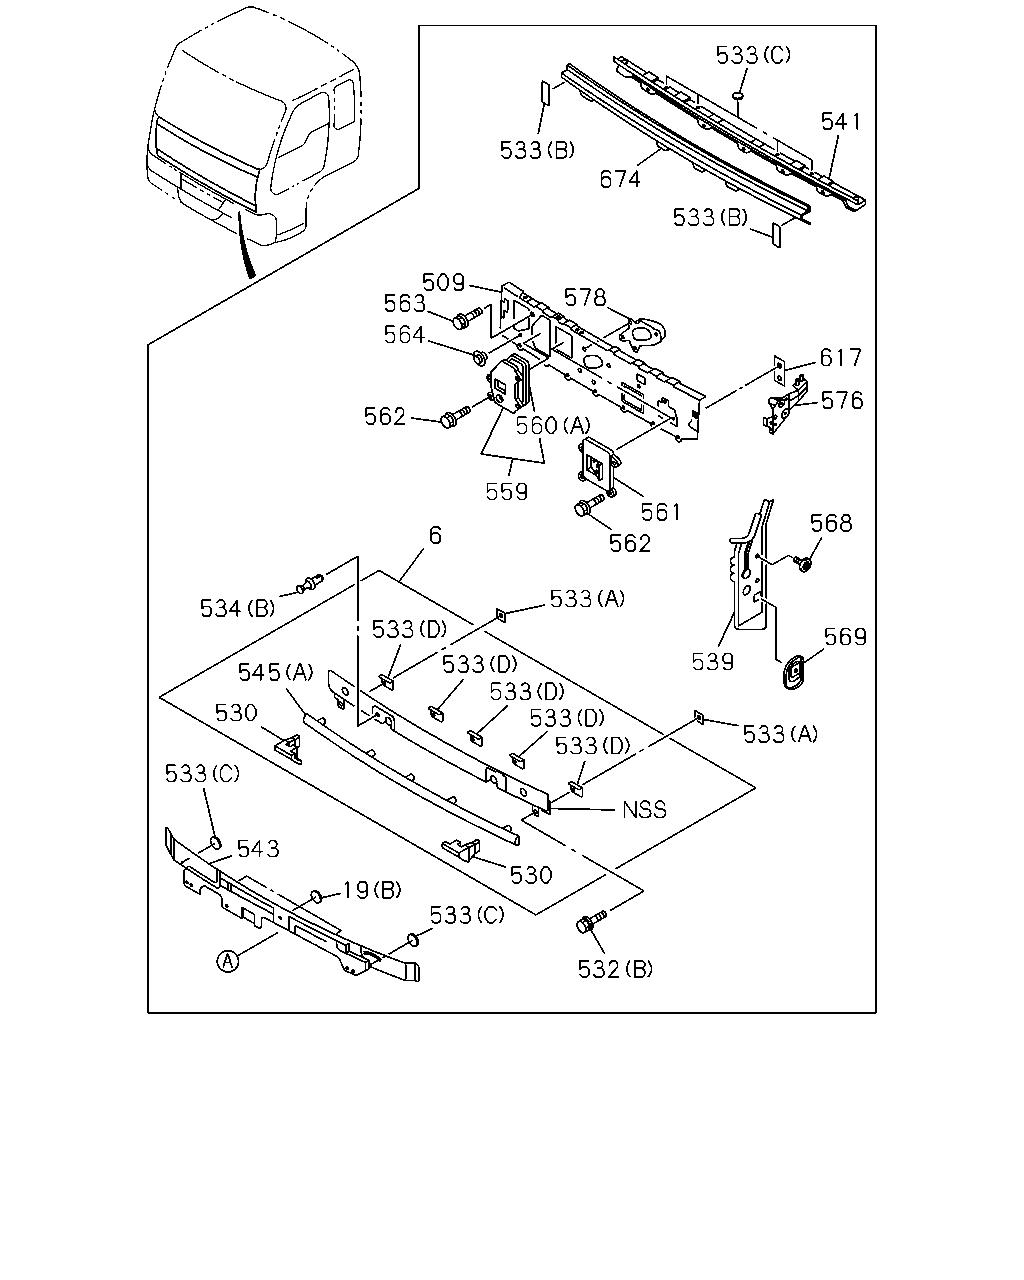 wiring diagram mth 11013 wiring diagram drawing sketch MSD Distributor Wiring c e 11013 cxz lhd wedge brake 05 6 exterior body wiring diagram mth on